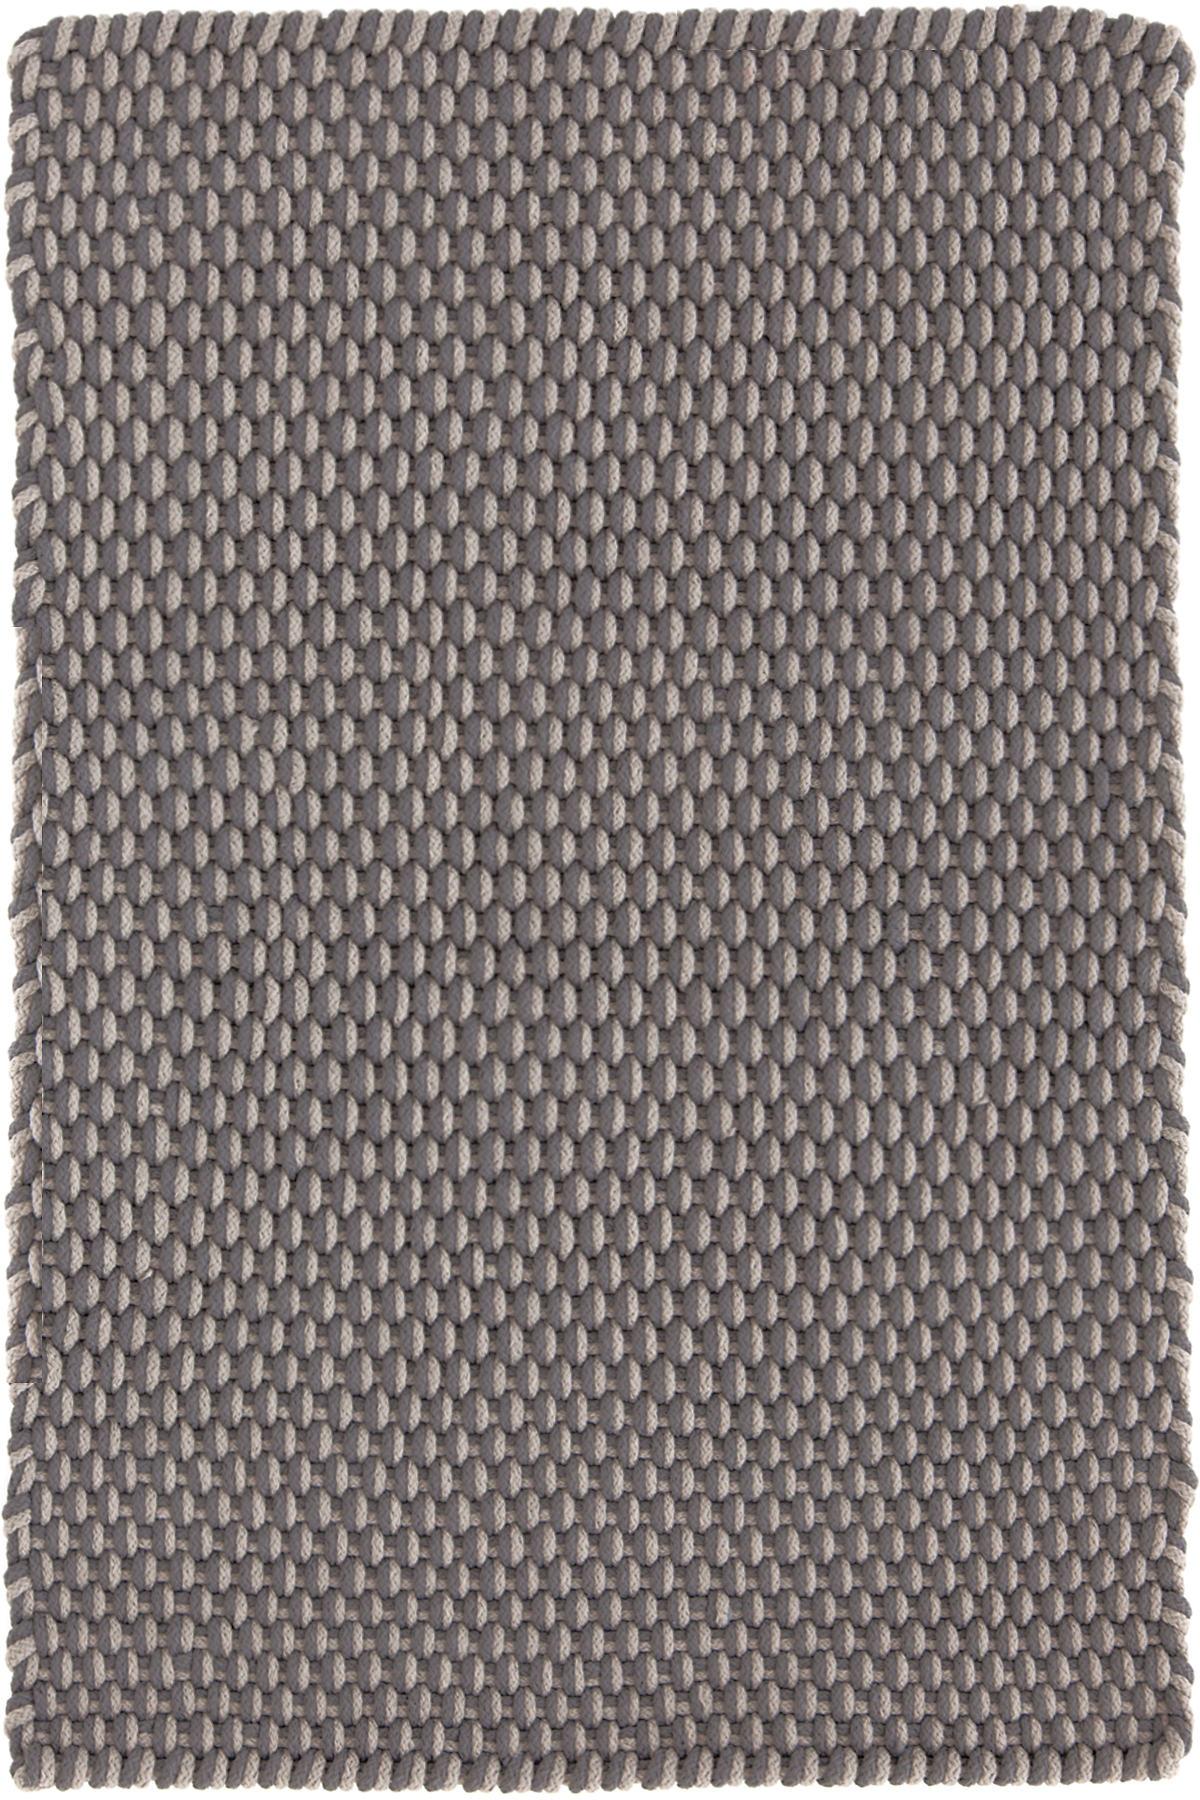 Two-Tone Rope Graphite/Fieldstone Indoor/Outdoor Rug